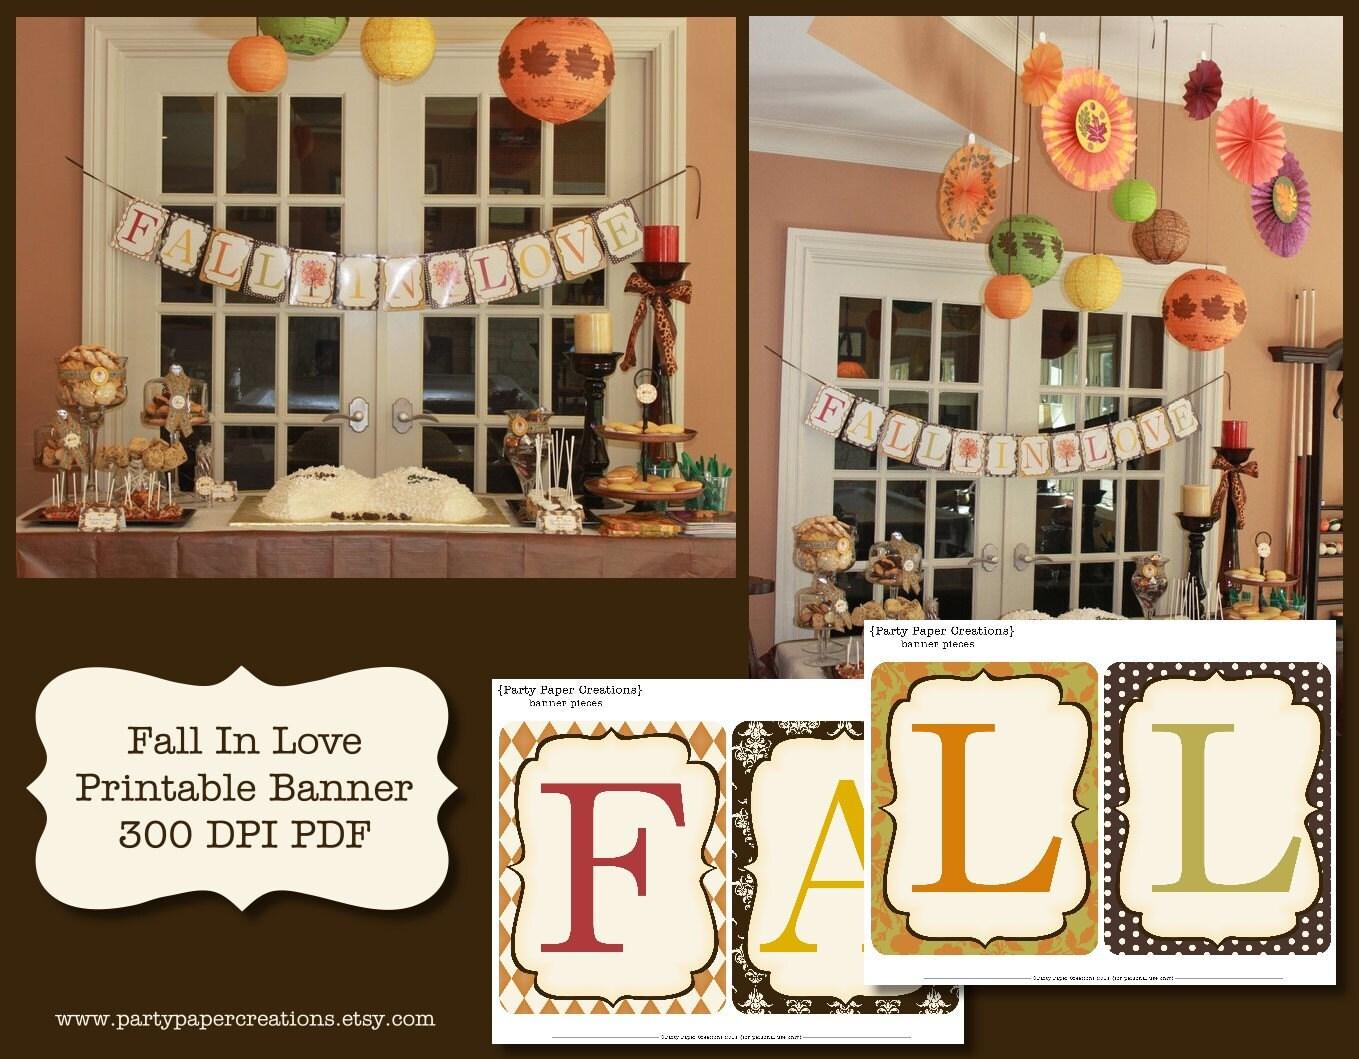 Fall in love bridal shower or wedding printable banner pdf zoom junglespirit Gallery